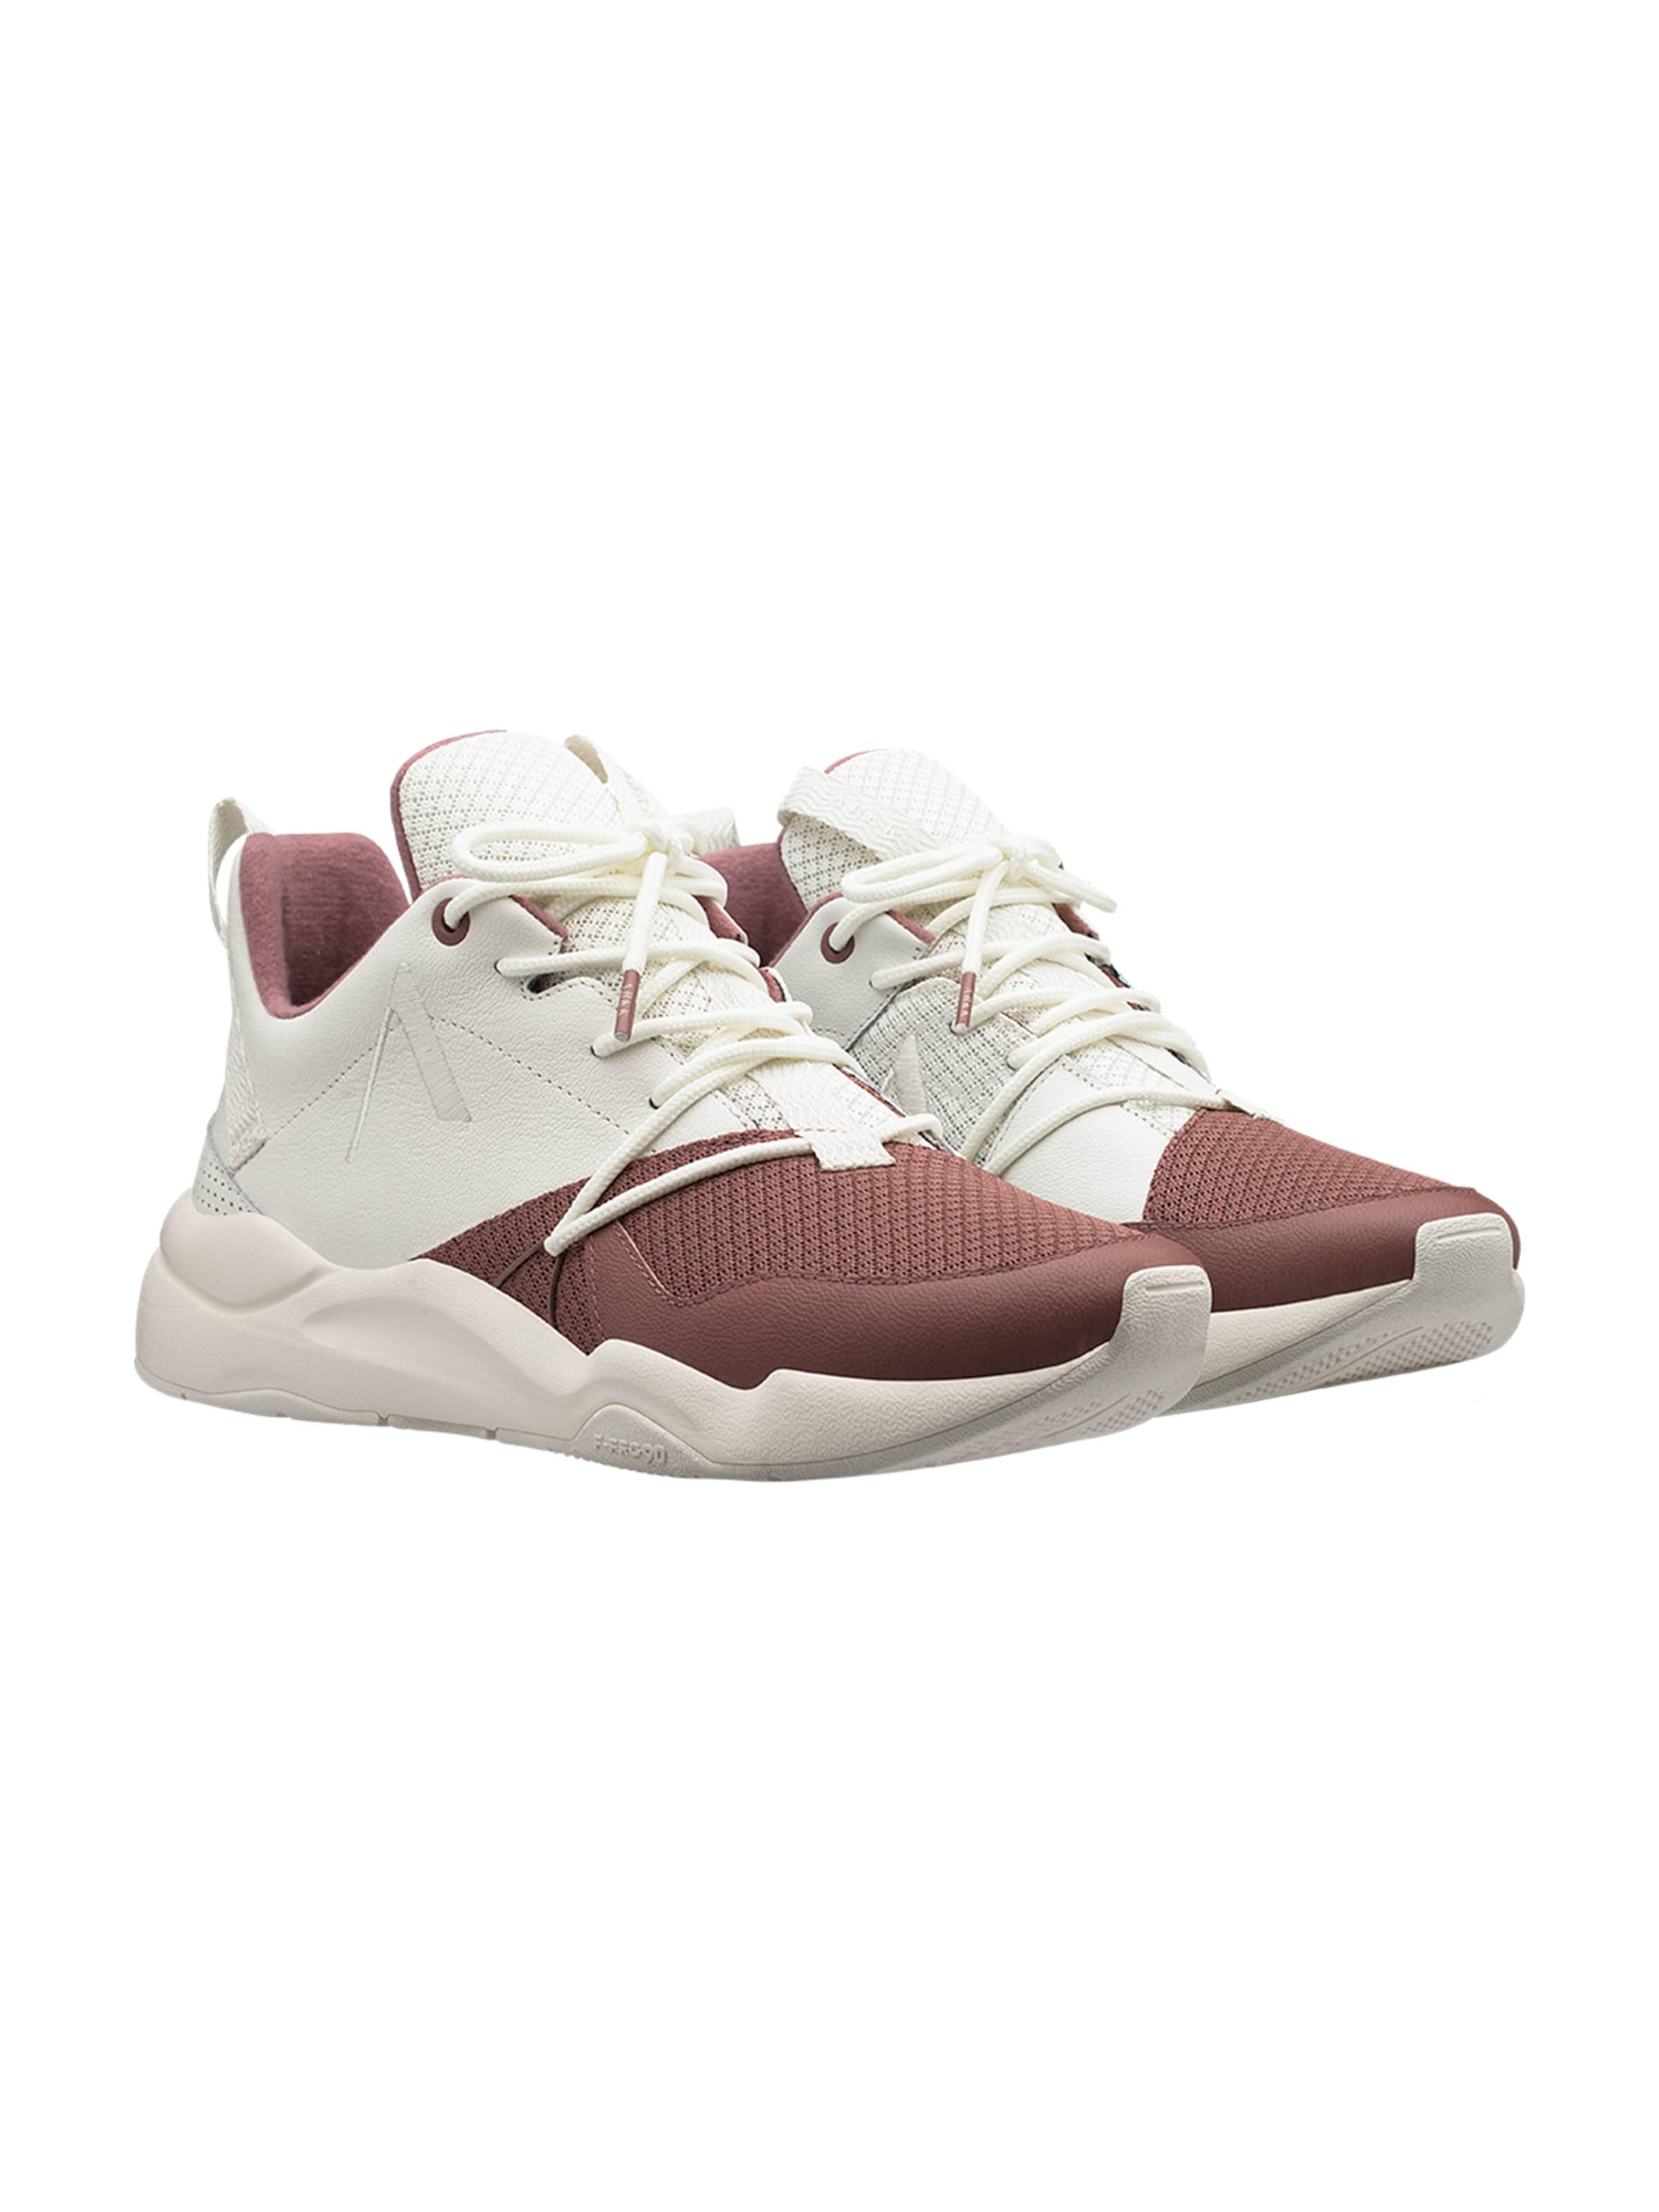 Arkk Laag In 'asymtrix pro90' BordeauxOffwhite Sneakers Copenhagen Mesh F ED2IeWH9Yb